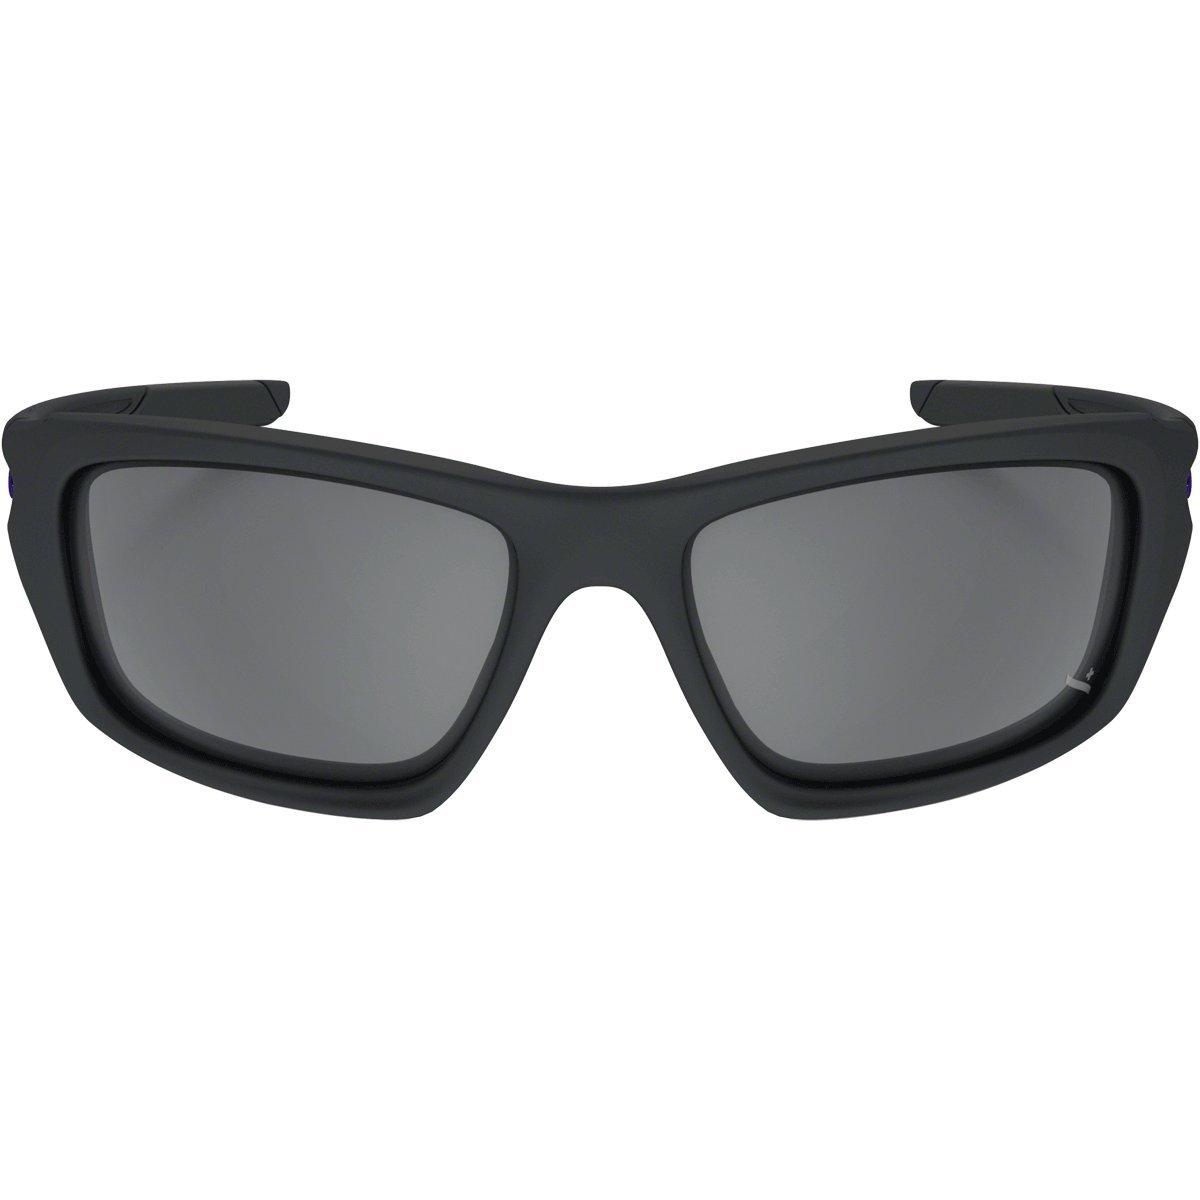 Oakley Men's Valve Rectangular, Carbon, 60 mm by Oakley (Image #4)